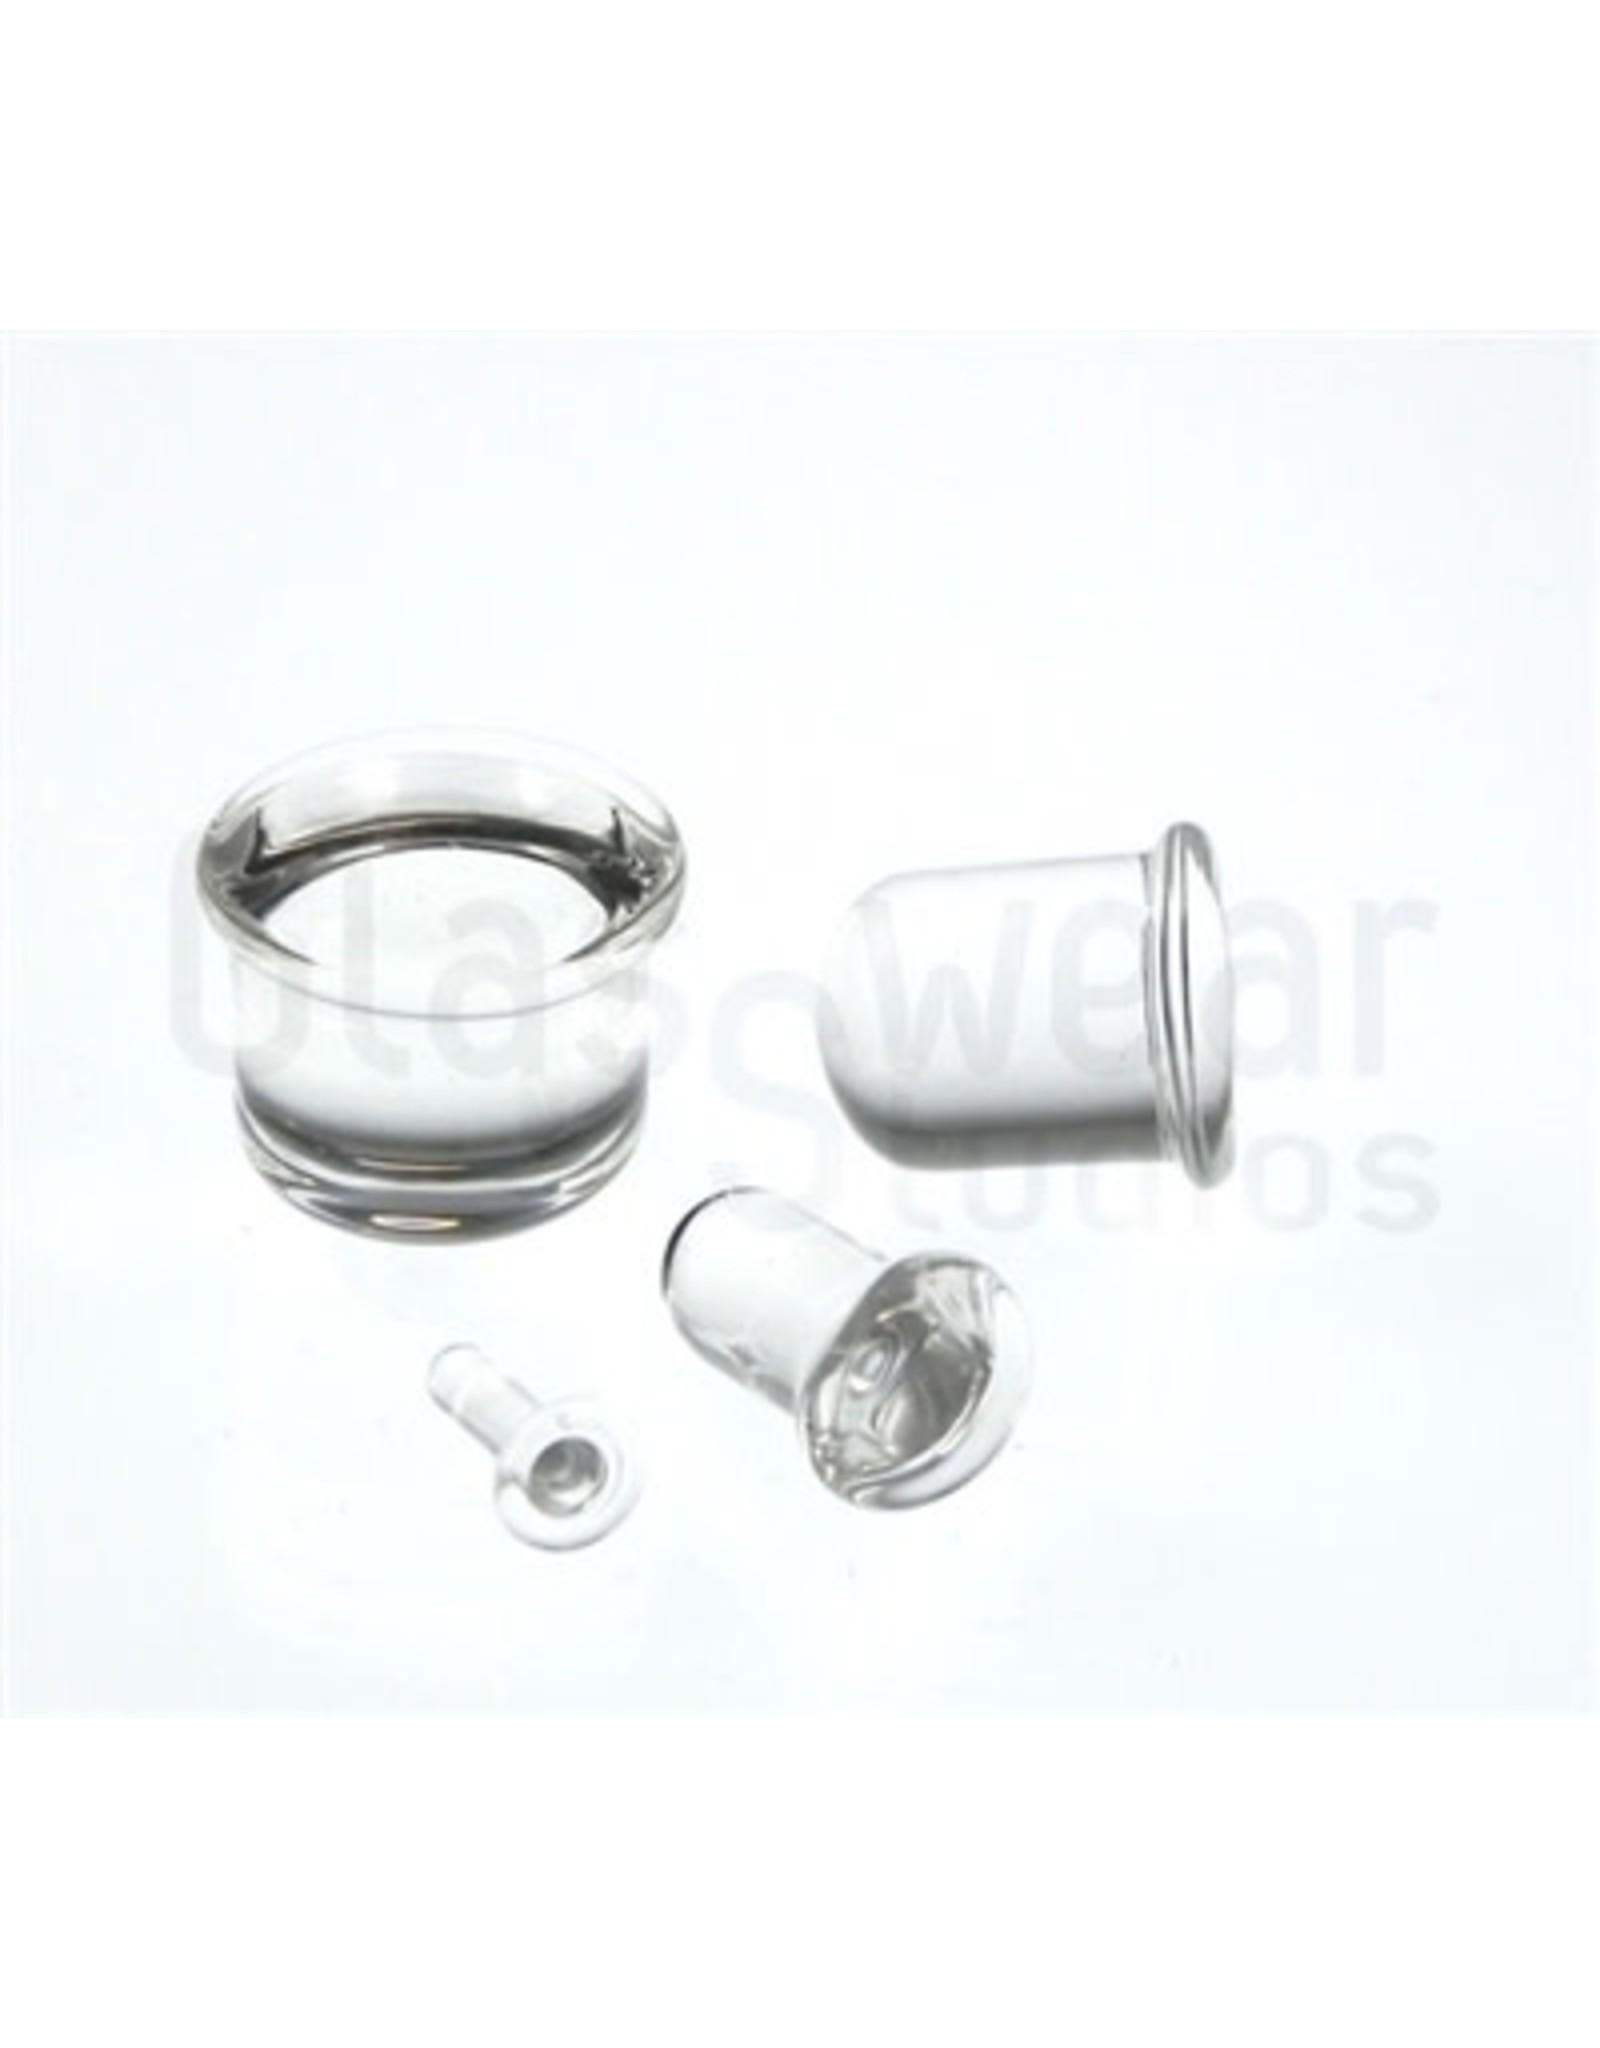 0g-8mm SF Glass Plugs